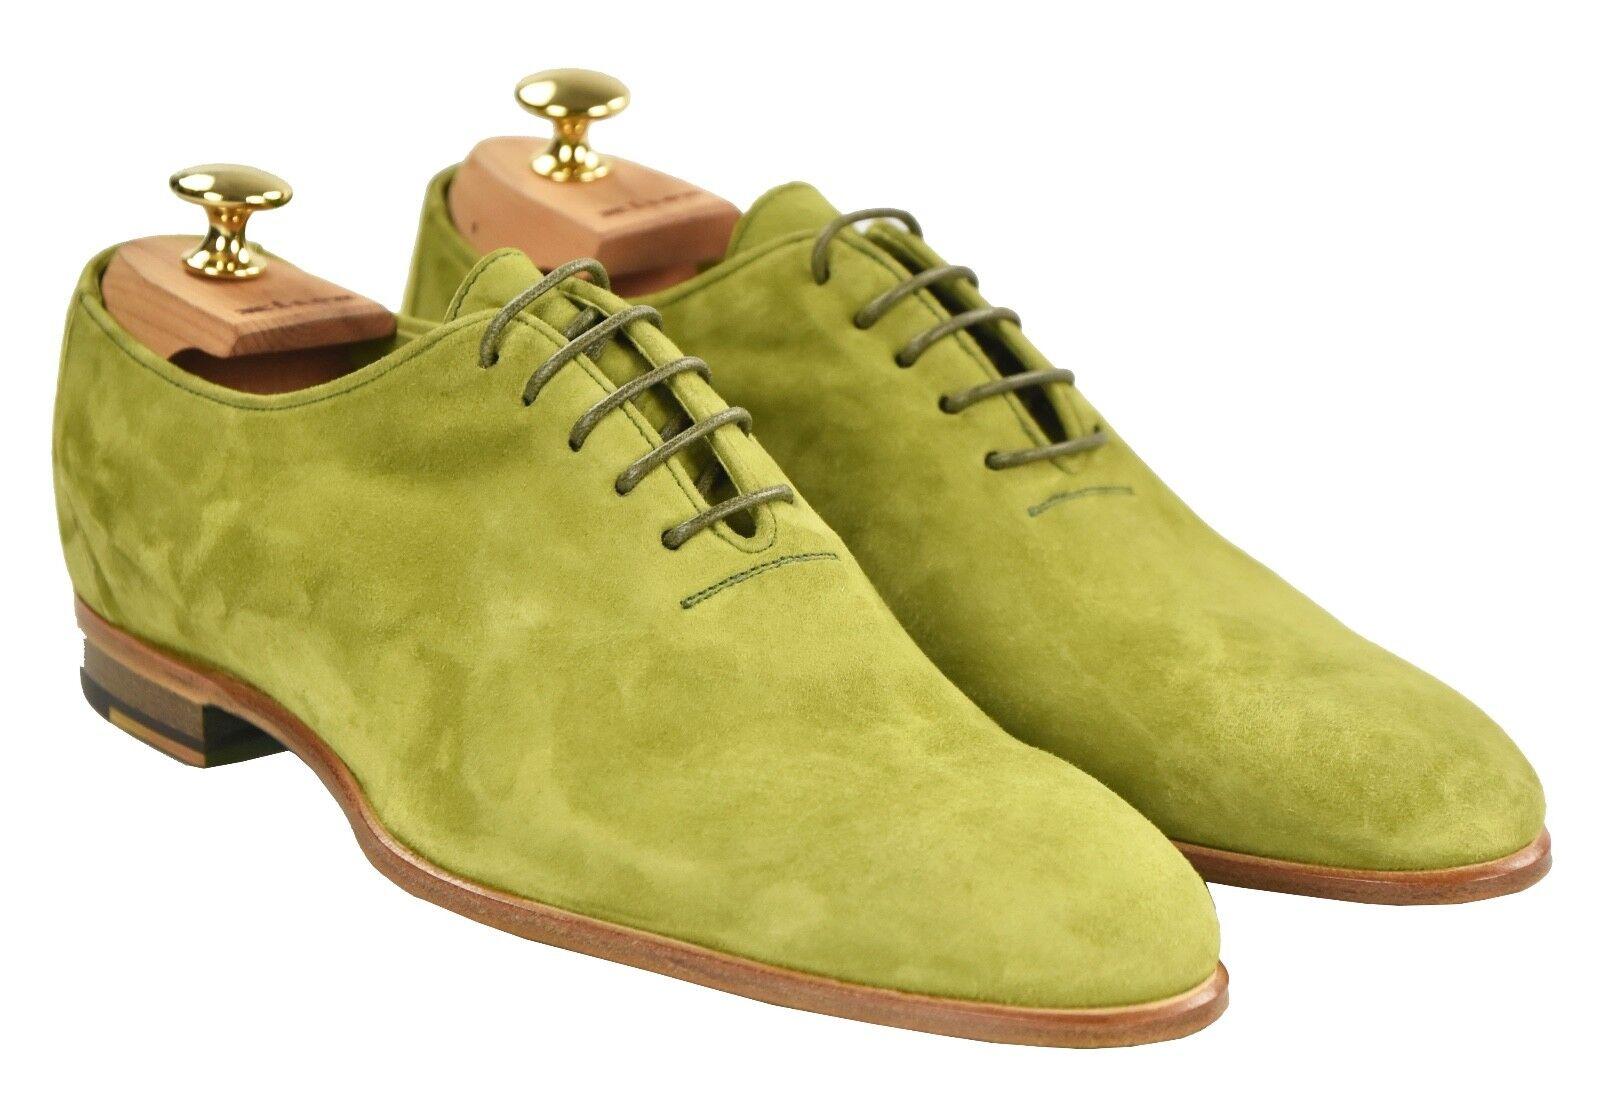 Nouveau KITON NAPOLI Chaussures 100% Cuir Daim Taille 7 US 40 EU 19O11